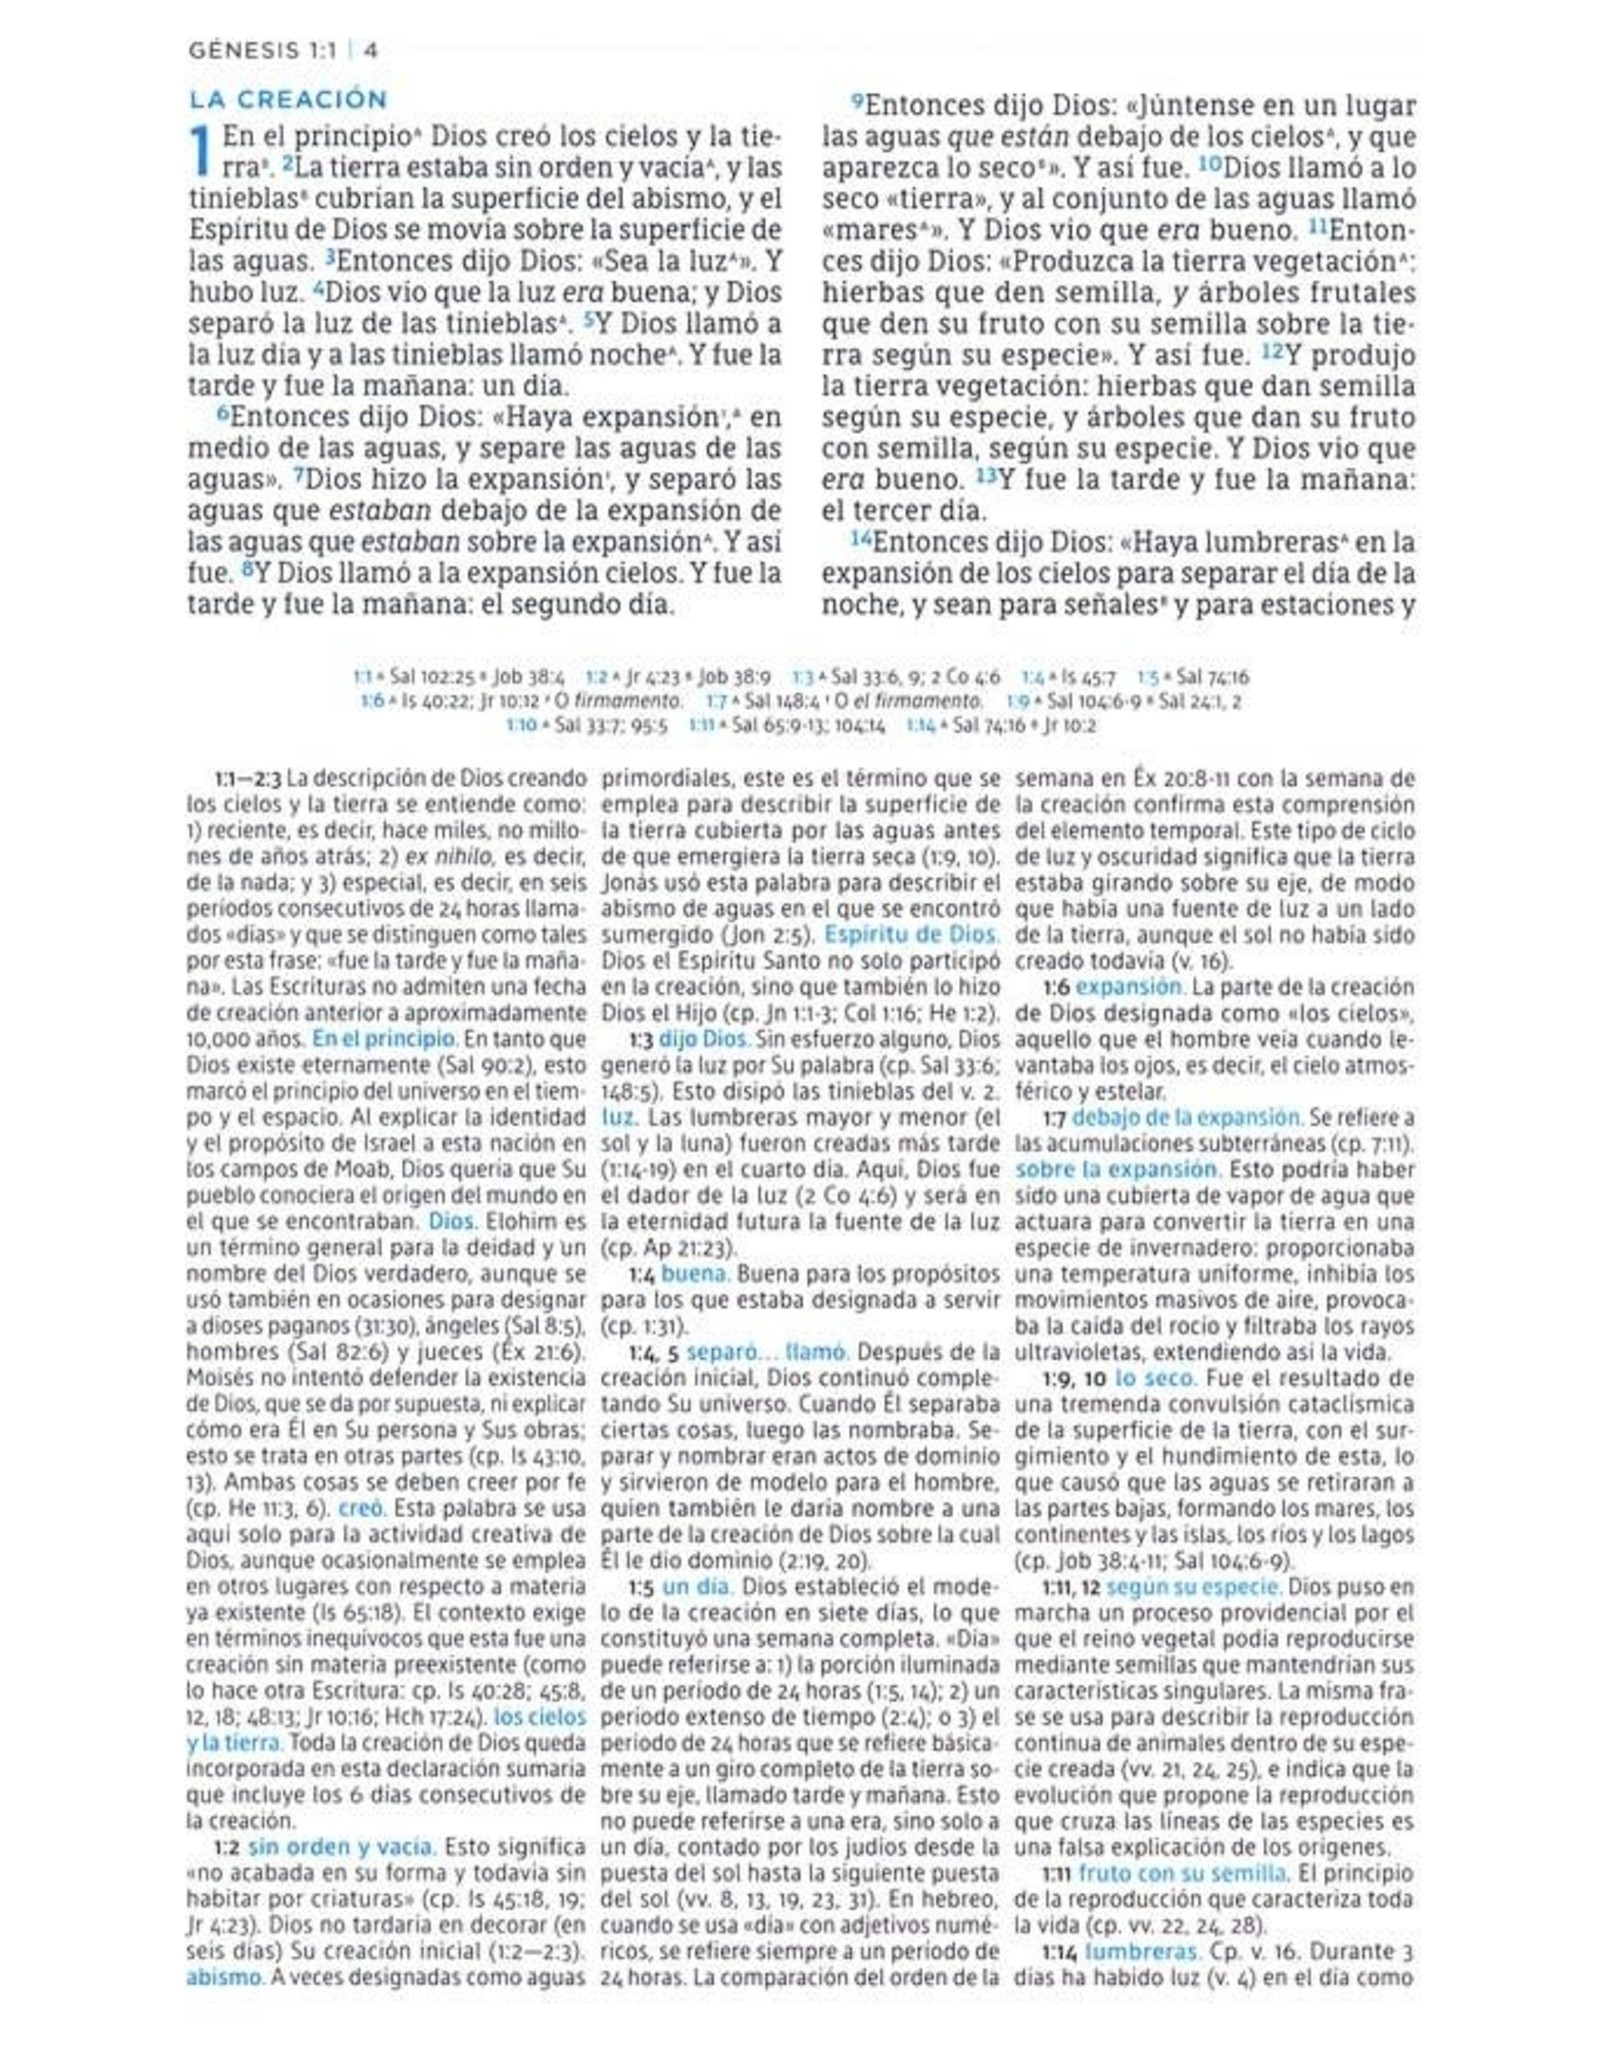 Vida NBLA Biblia de Estudio MacArthur, Leathersoft, Cafe, Interior a dos colores, con indice (NBLA MSB 2nd Edition Leathersoft Brown, Thumb Indexed Span)